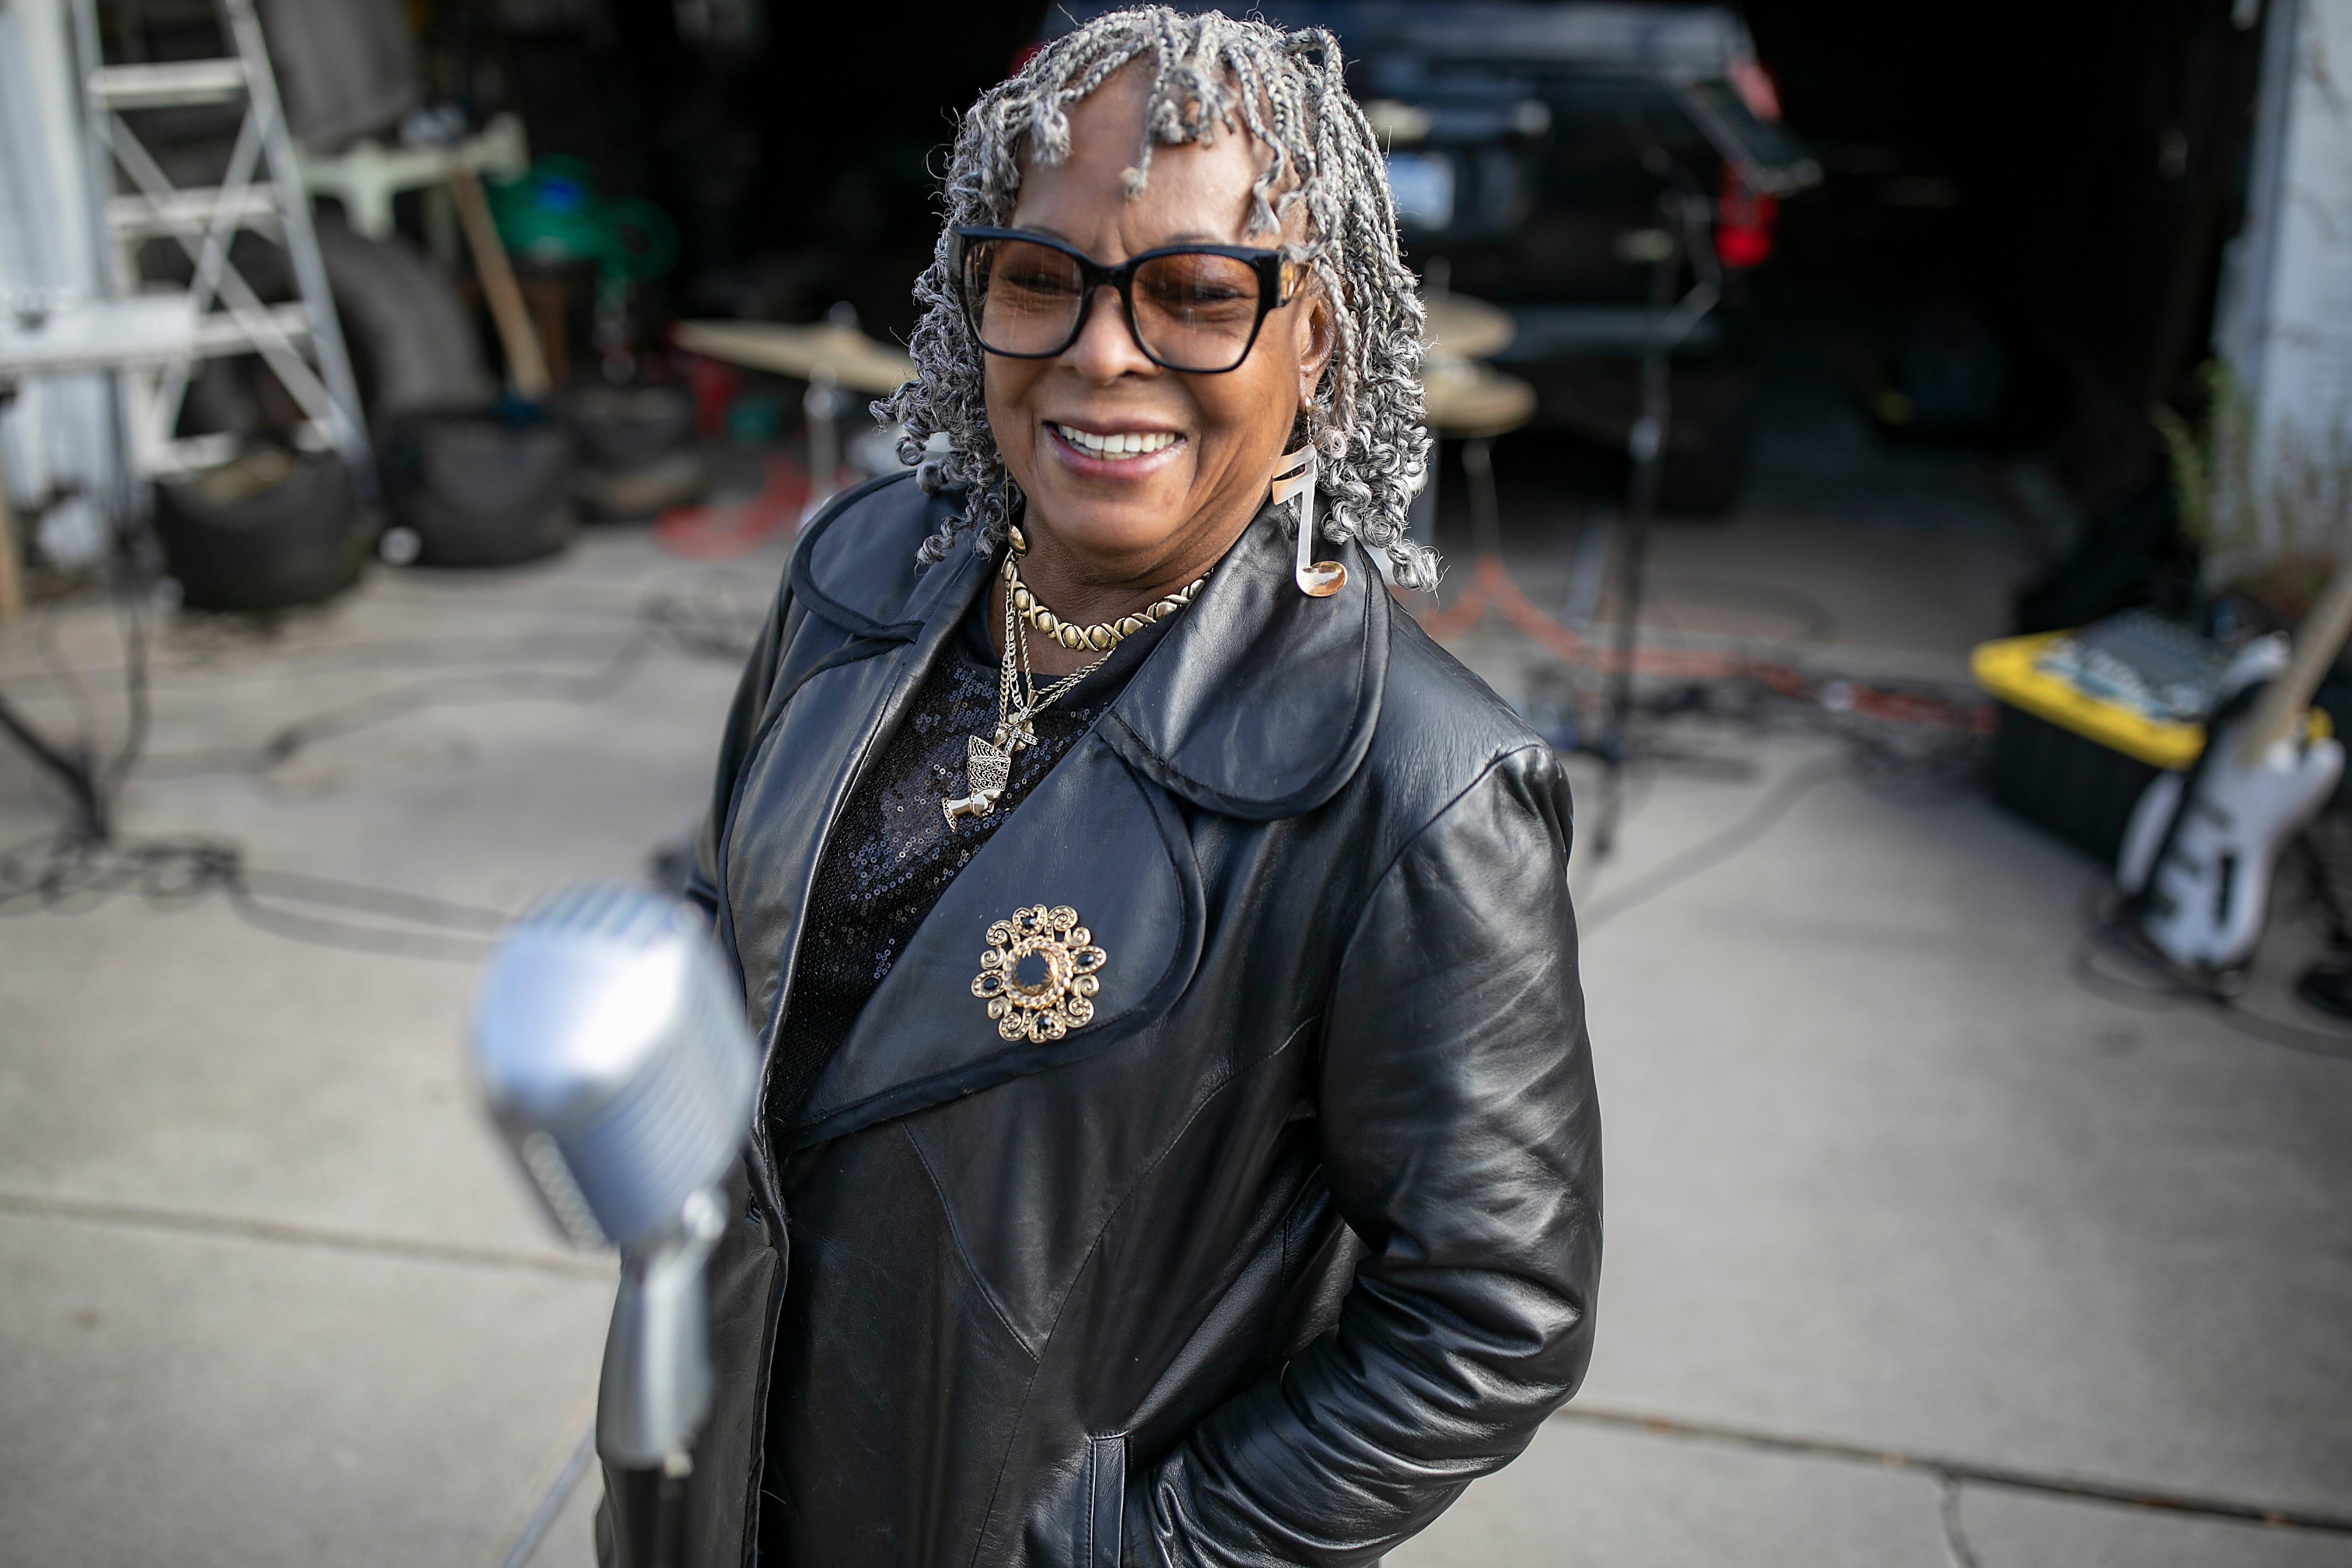 Legendary Motown recording artist Martha Reeves poses for a portrait in Detroit Monday, Nov. 16, 2020.